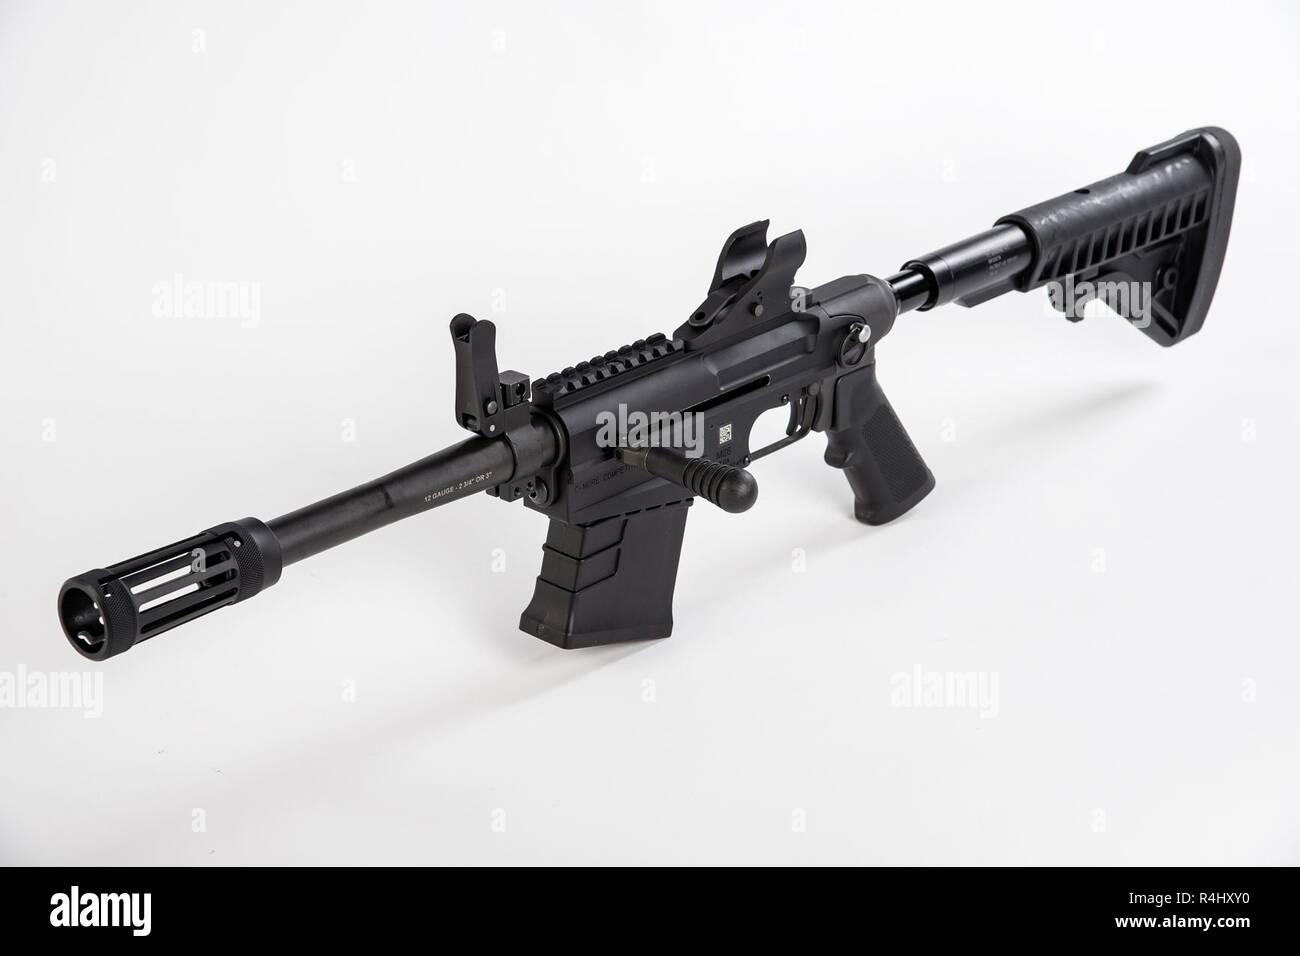 The M26 Modular Accessory Shotgun System (MASS) is a developmental